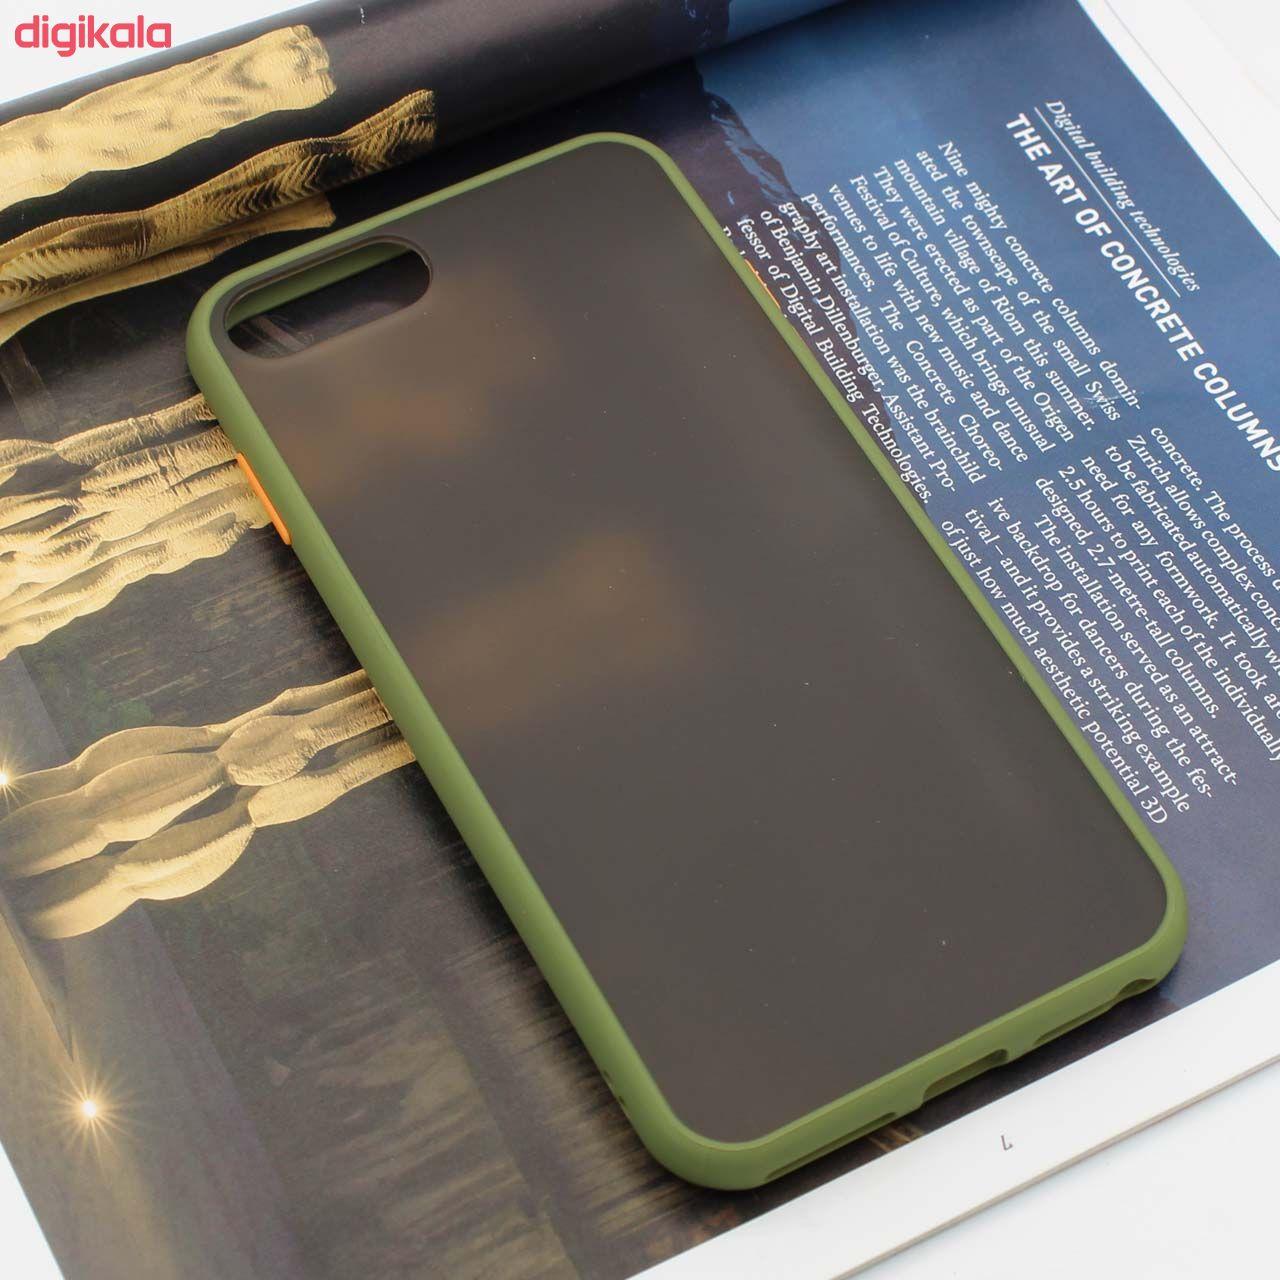 کاور کینگ پاور مدل M21 مناسب برای گوشی موبایل اپل iPhone 7 Plus/ 8 Plus main 1 2